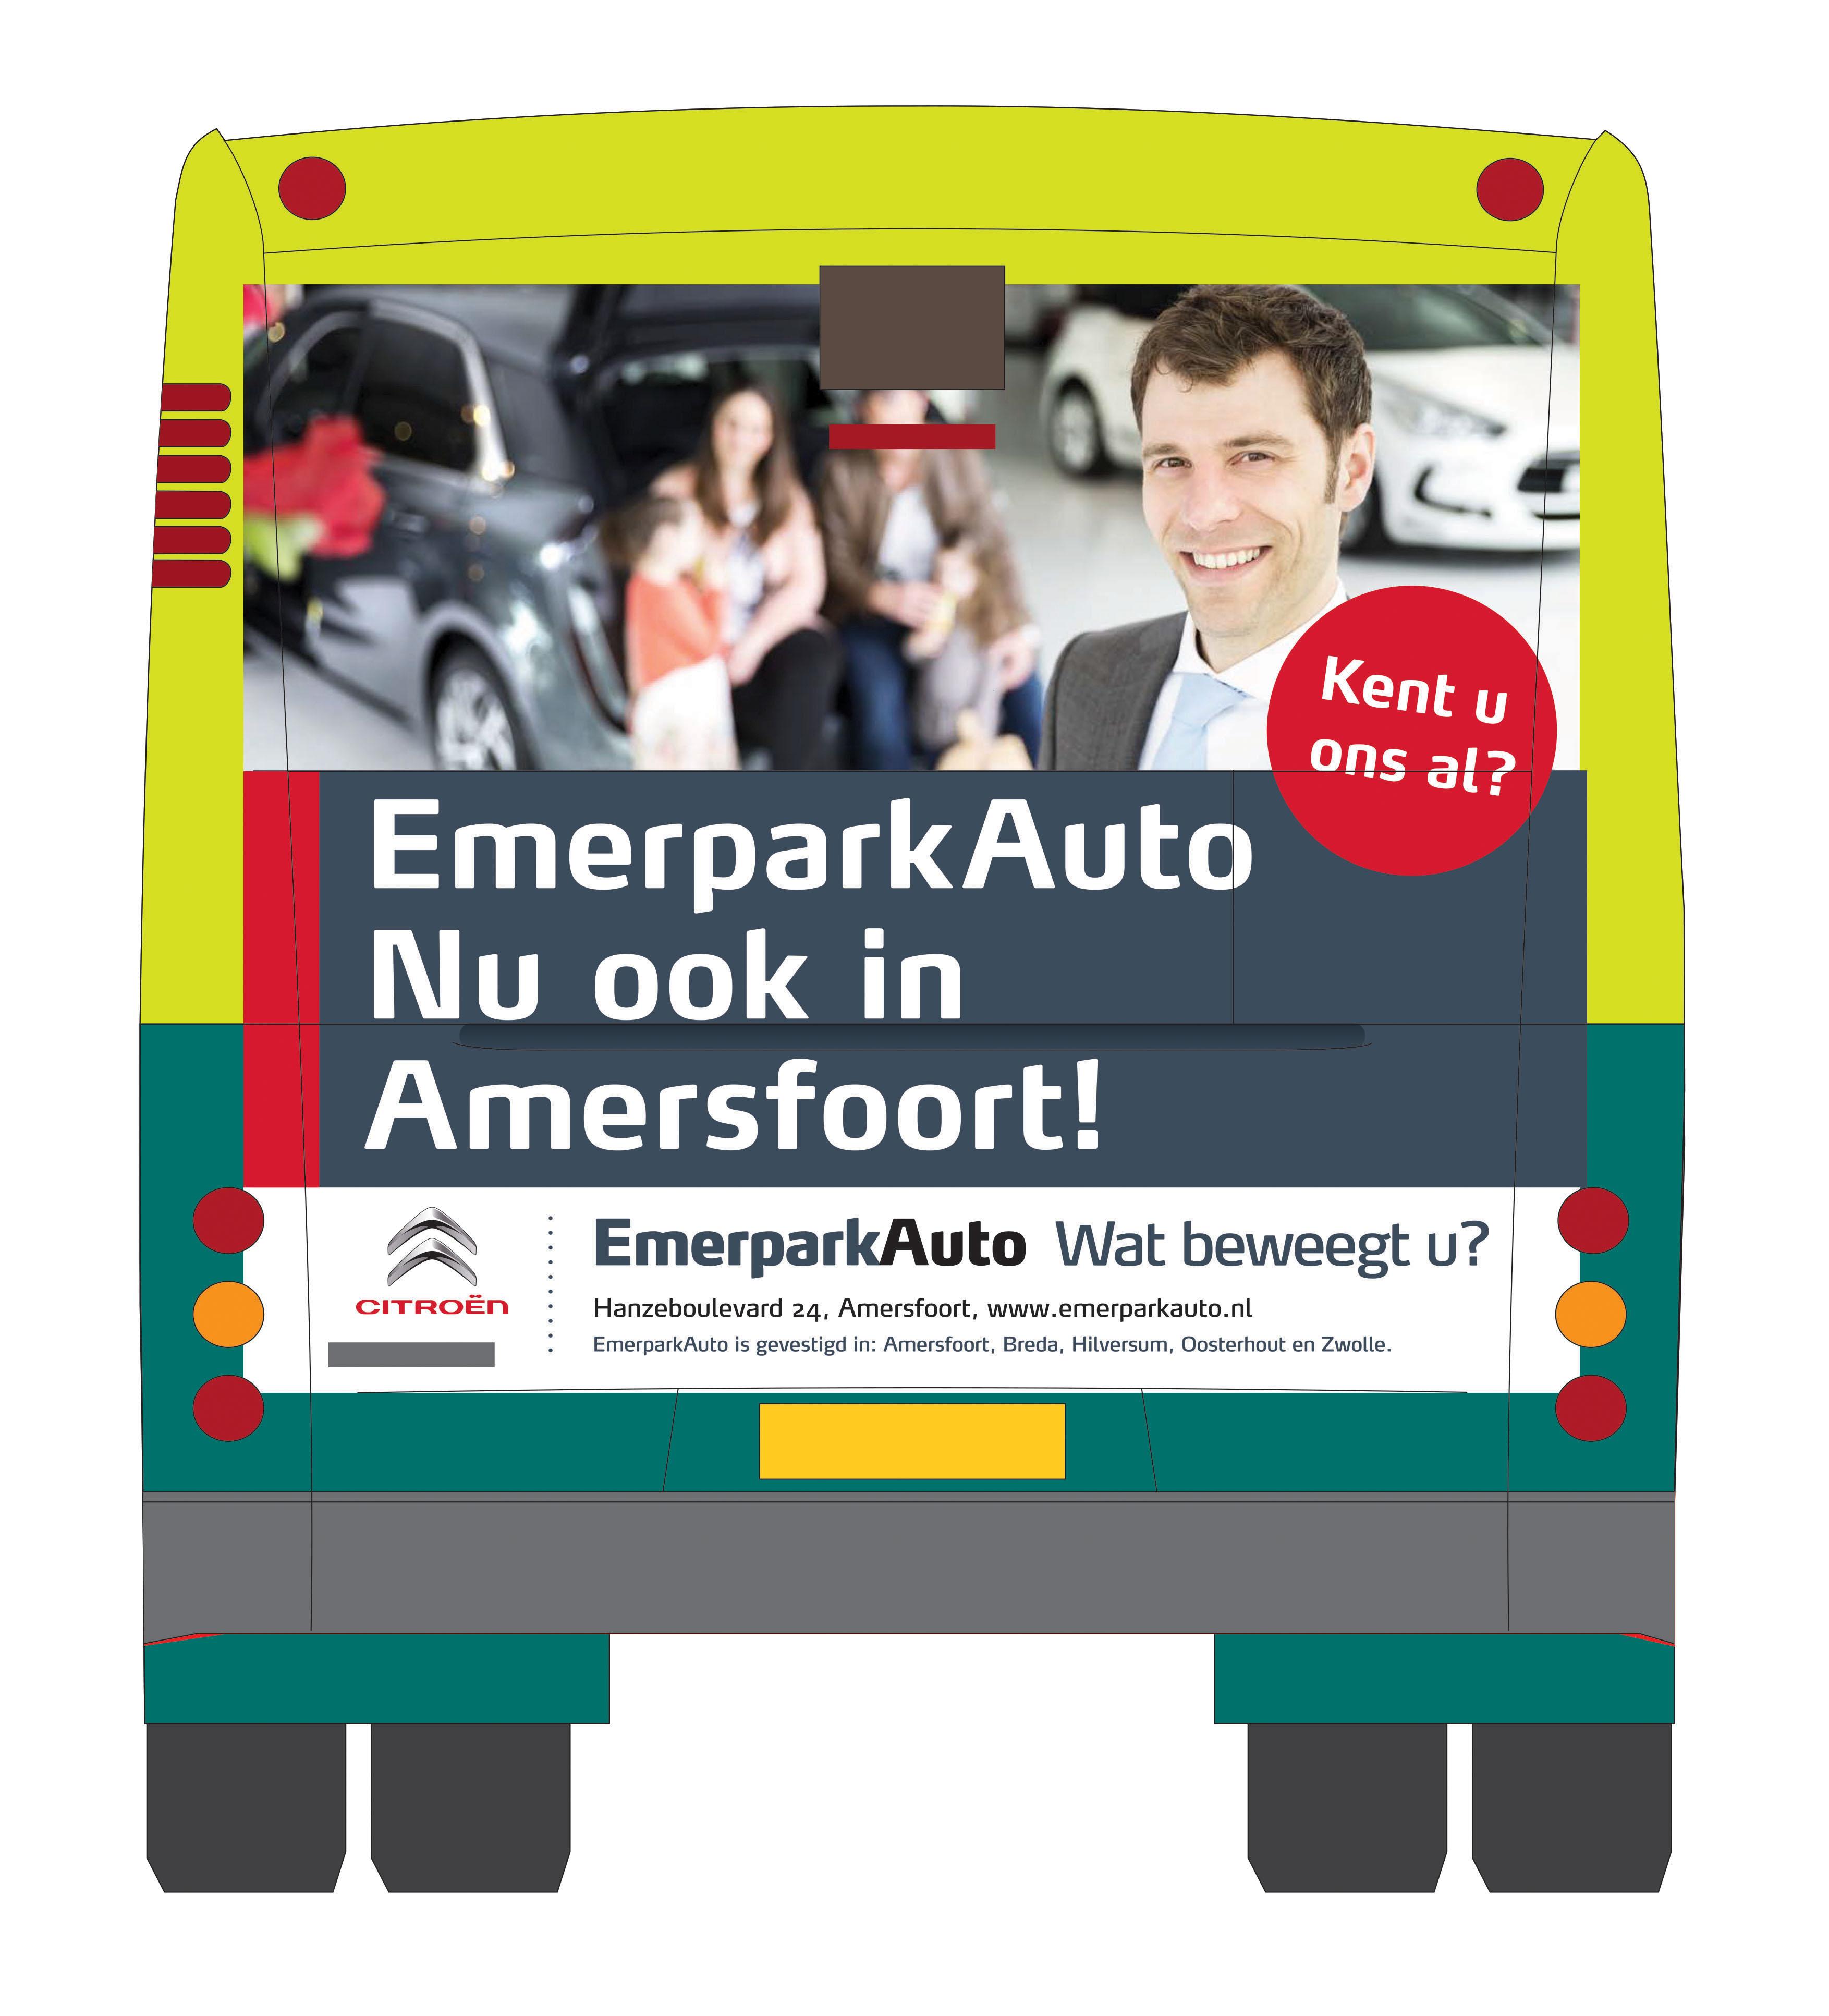 009 EmerparkAuto bestickering bus3_1op10